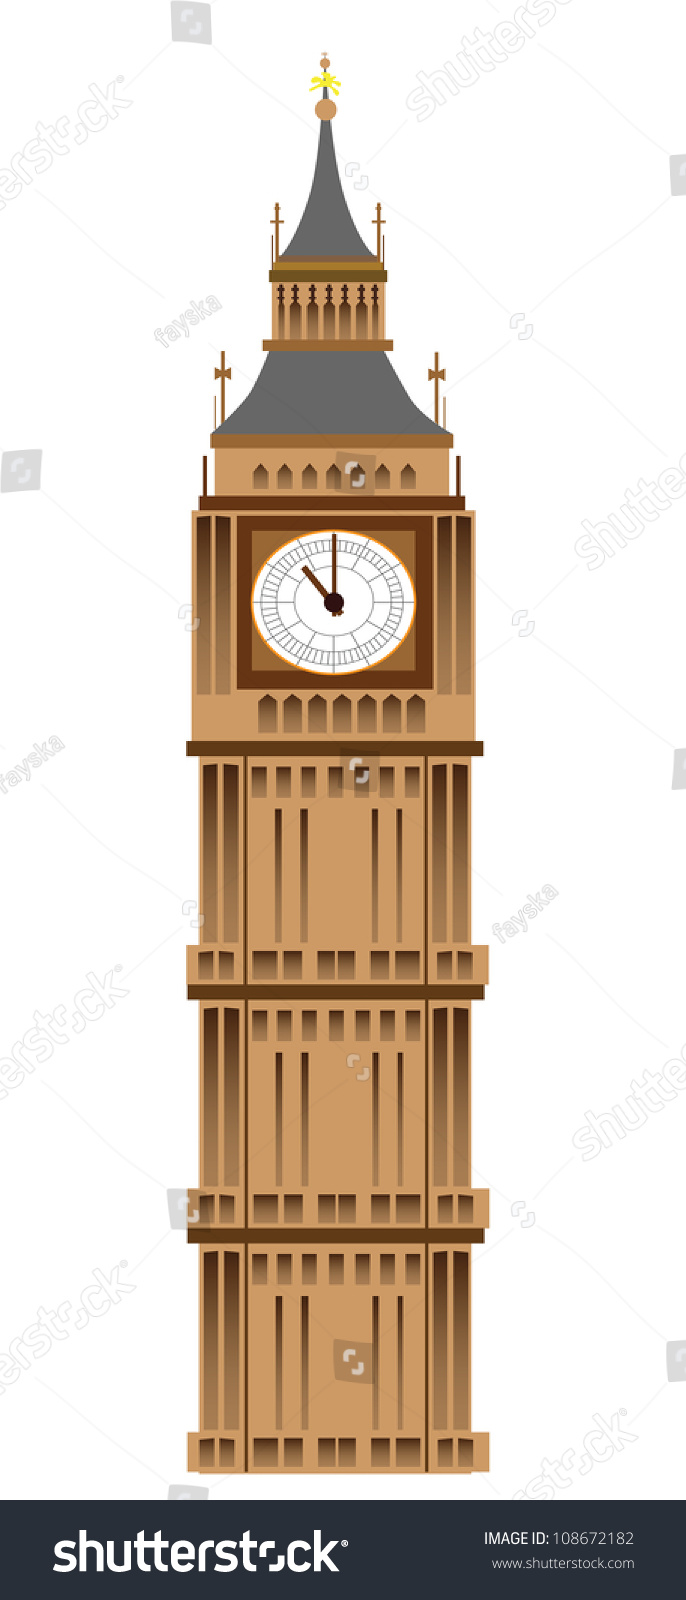 clip art clock tower - photo #29